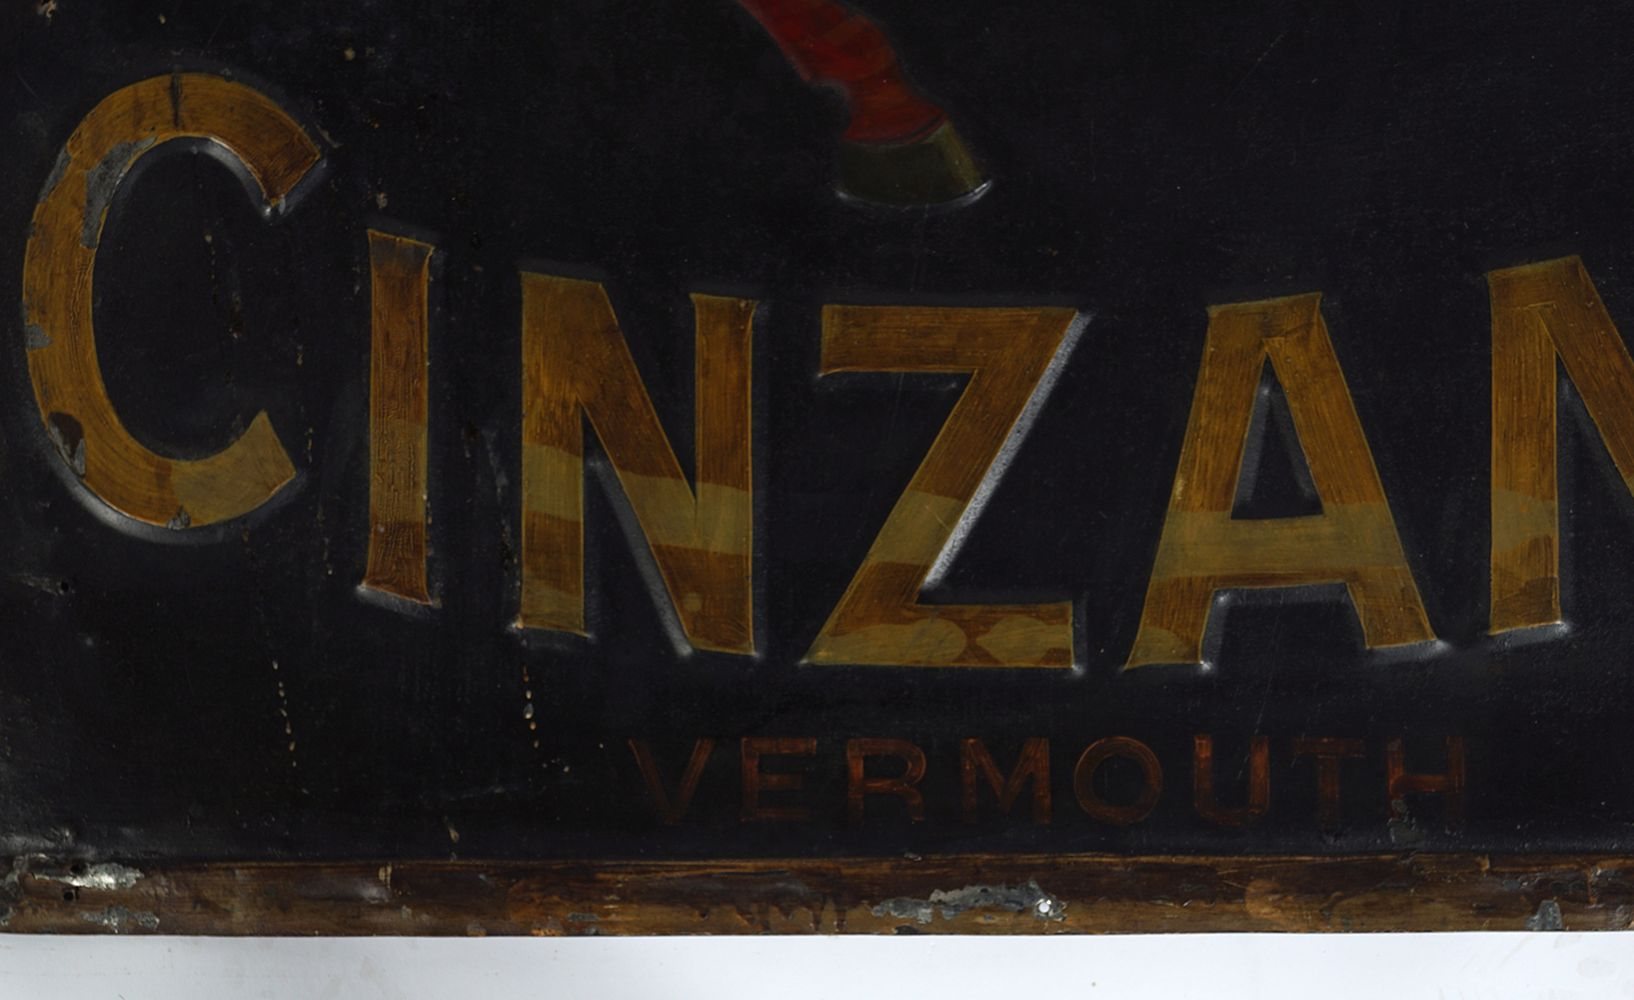 CINZANO VERMOUTH SIGN - Image 3 of 4